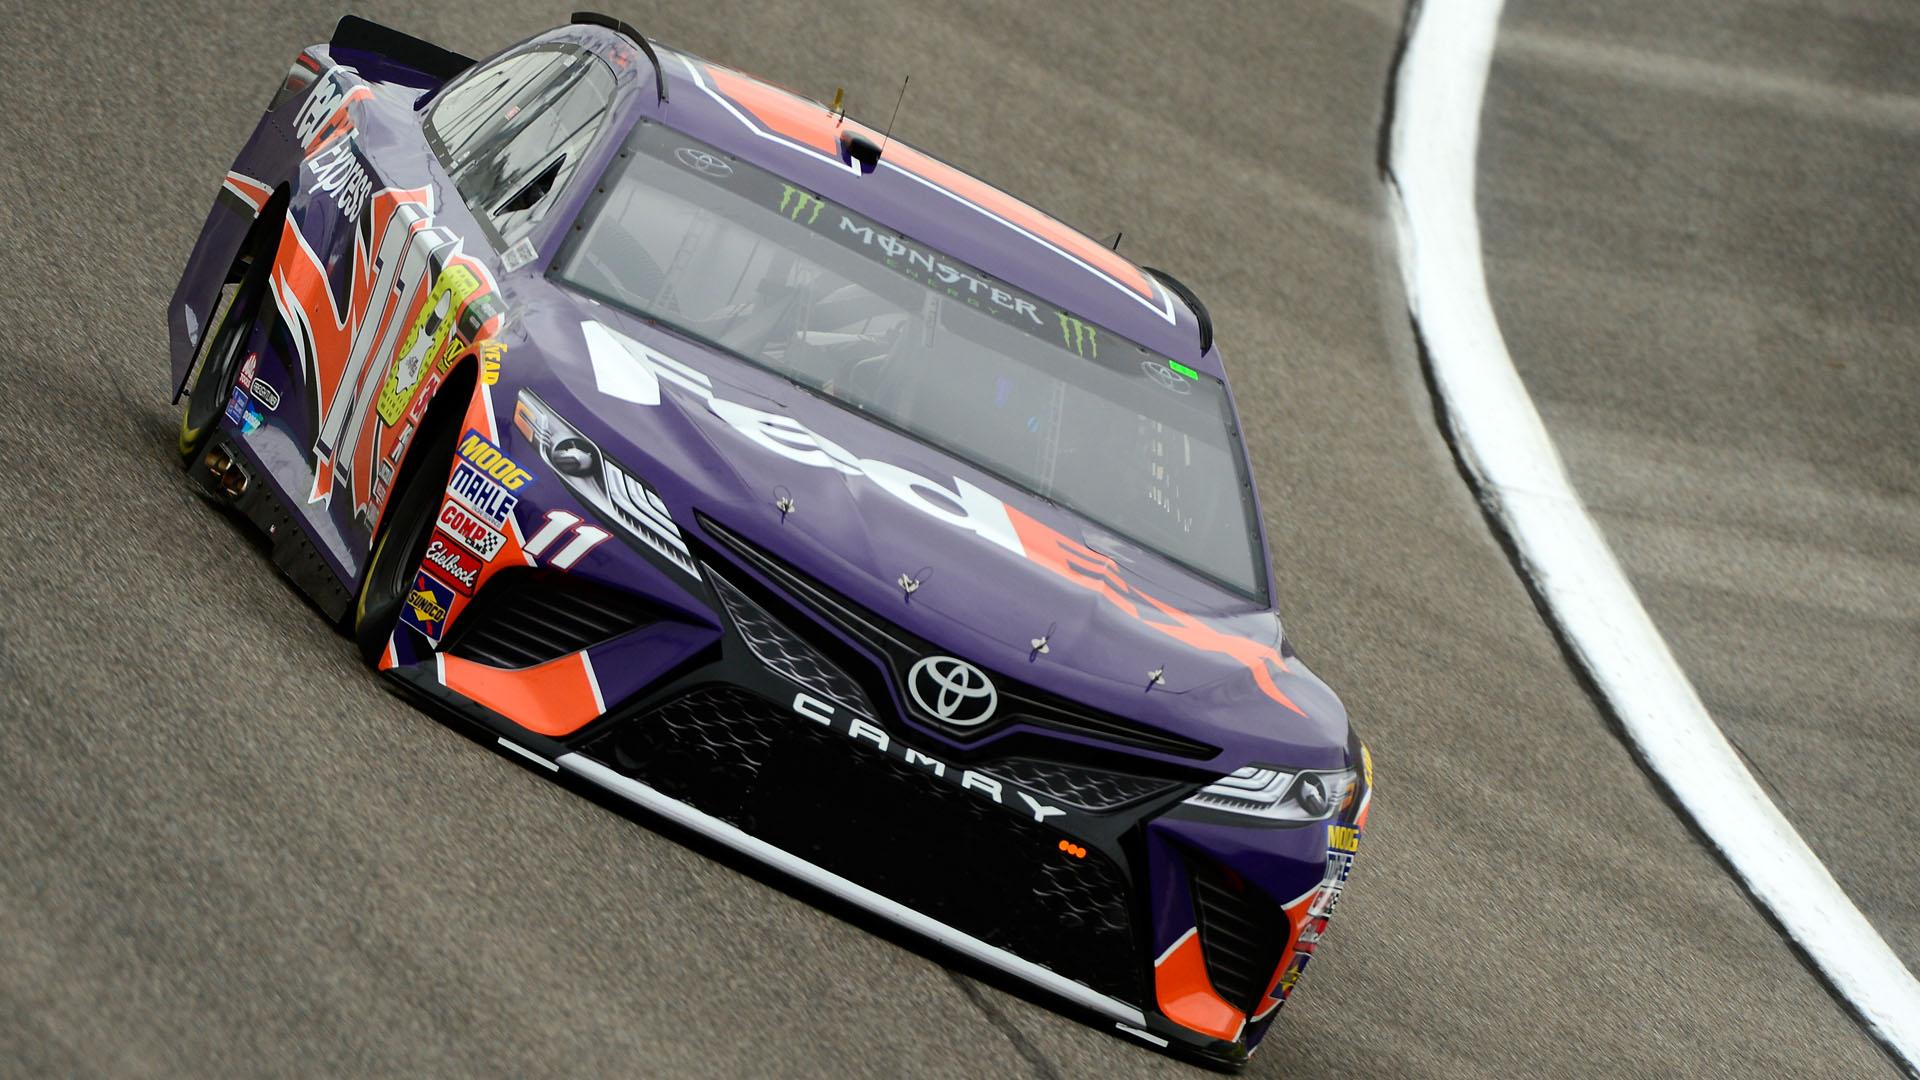 NASCAR starting lineup at Homestead-Miami: Denny Hamlin wins pole; Kyle Busch starts 2nd